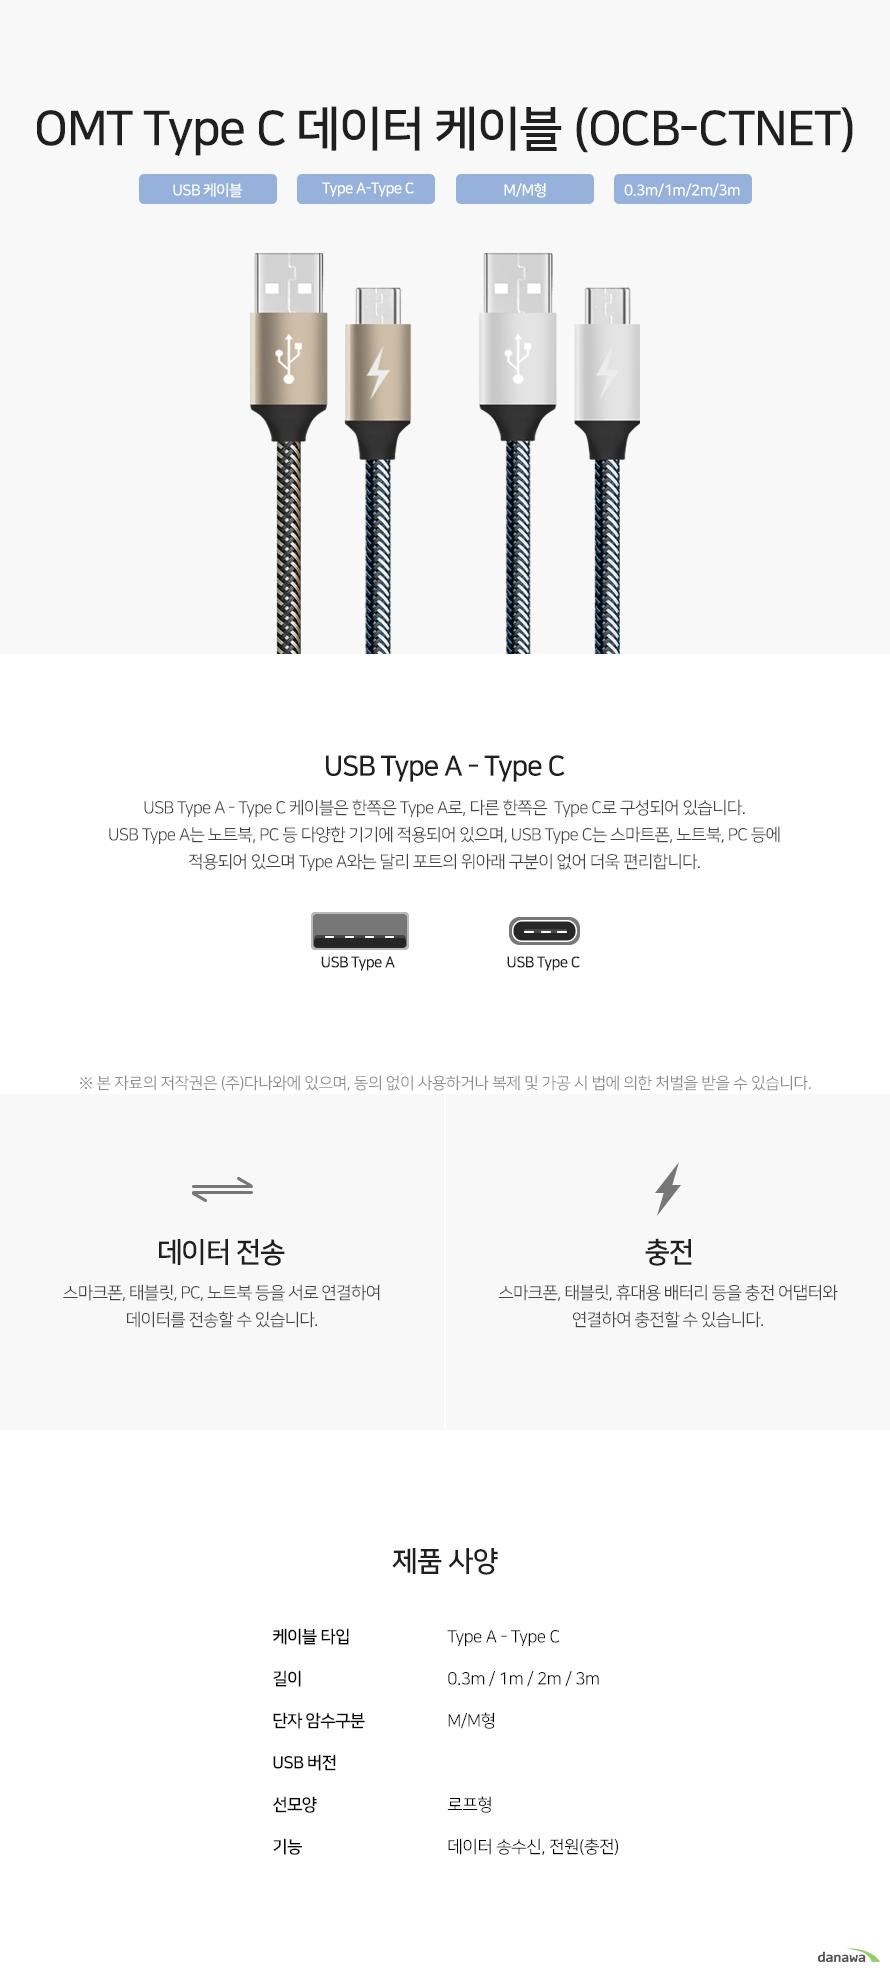 USB Type A - Type C 케이블은 한쪽은 Type A로, 다른 한쪽은  Type C로 구성되어 있습니다.  USB Type A는 노트북, PC 등 다양한 기기에 적용되어 있으며, USB Type C는 스마트폰, 노트북, PC 등에 적용되어 있으며 Type A와는 달리 포트의 위아래 구분이 없어 더욱 편리합니다.   스마크폰, 태블릿, PC, 노트북 등을 서로 연결하여 데이터를 전송할 수 있습니다.   스마크폰, 태블릿, 휴대용 배터리 등을 충전 어댑터와 연결하여 충전할 수 있습니다.